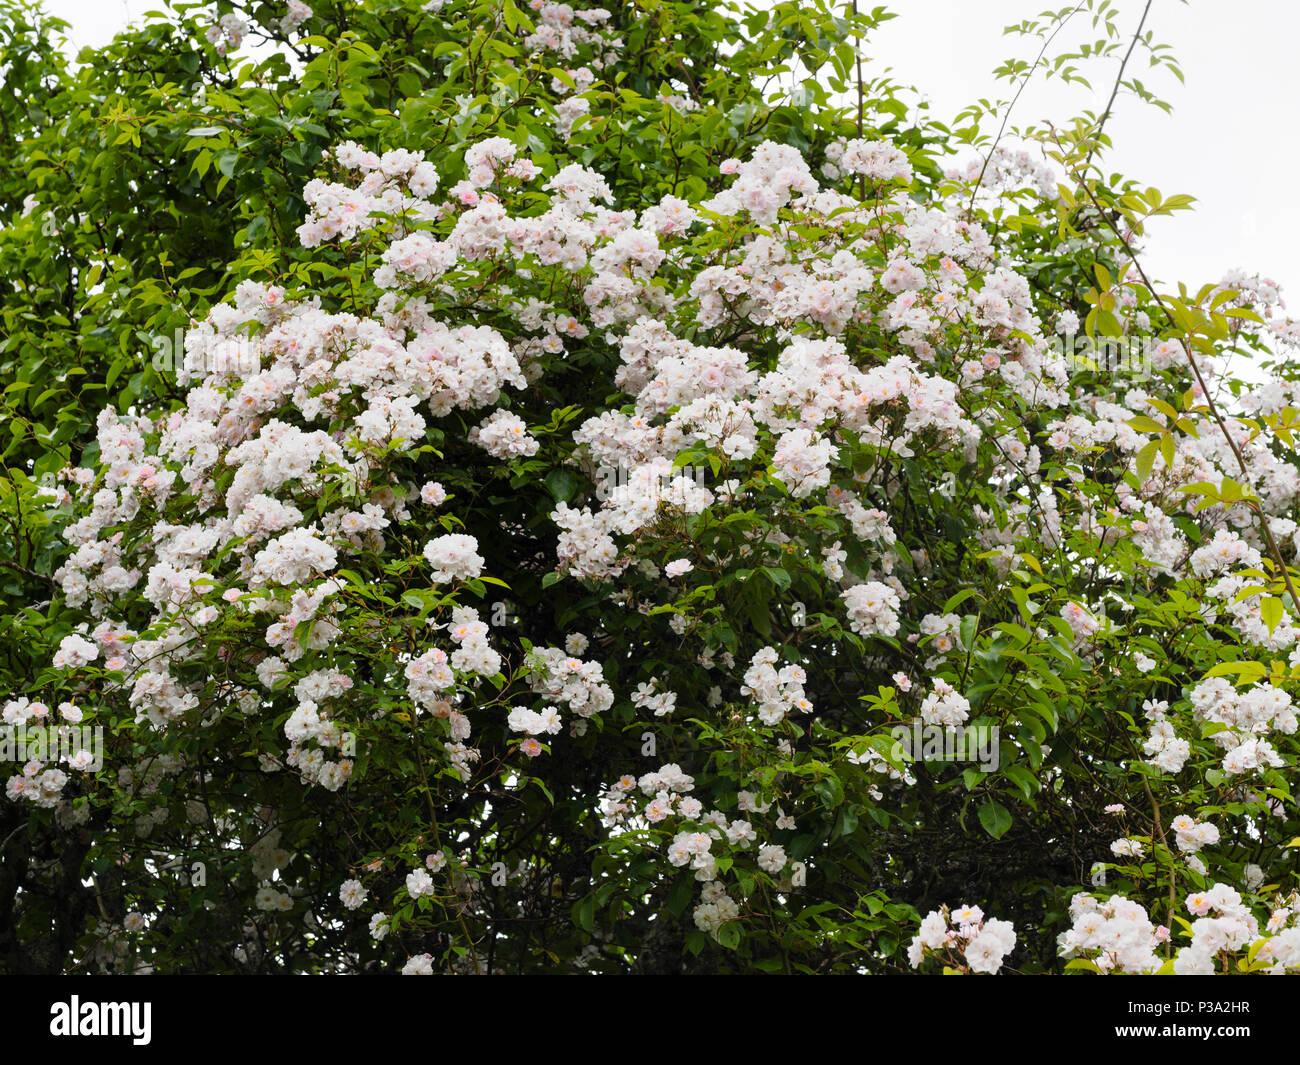 Massed flowers of the vigorous, fragrant rambler rose, Rosa 'Paul's Himalayan Musk', colonising a tree - Stock Image